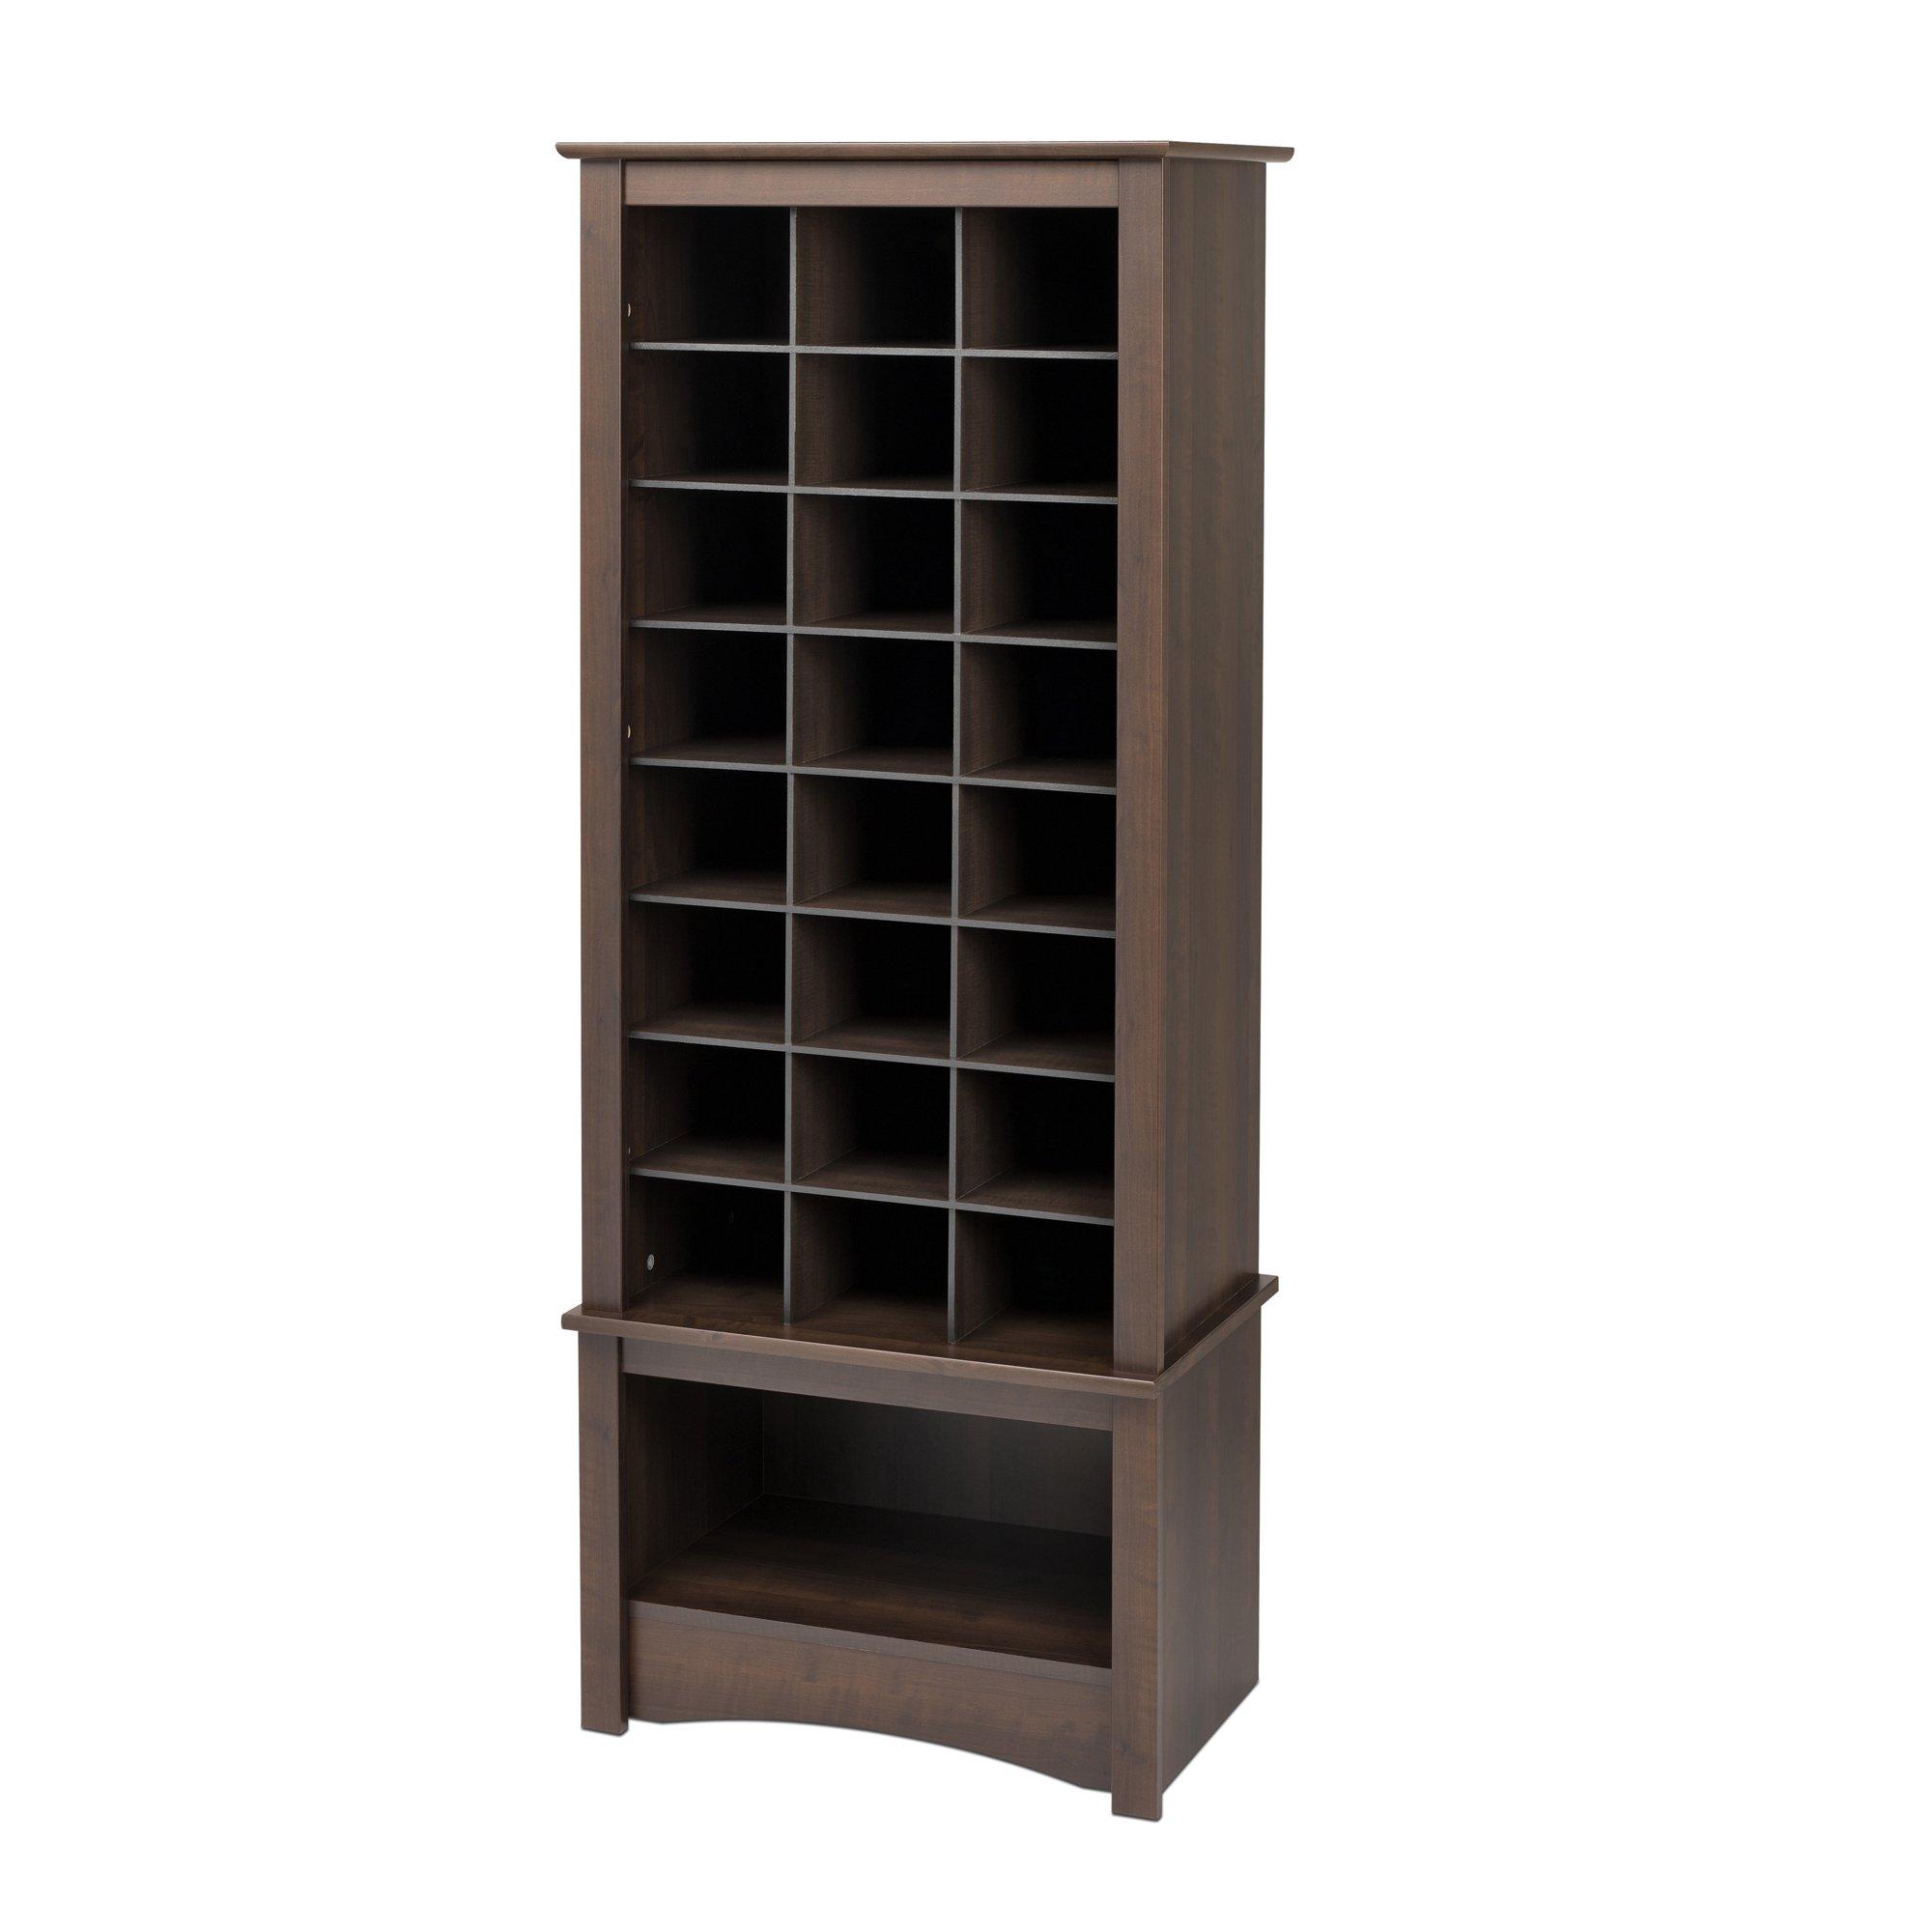 Espresso Tall Shoe Cubbie Cabinet by Prepac (Image #1)